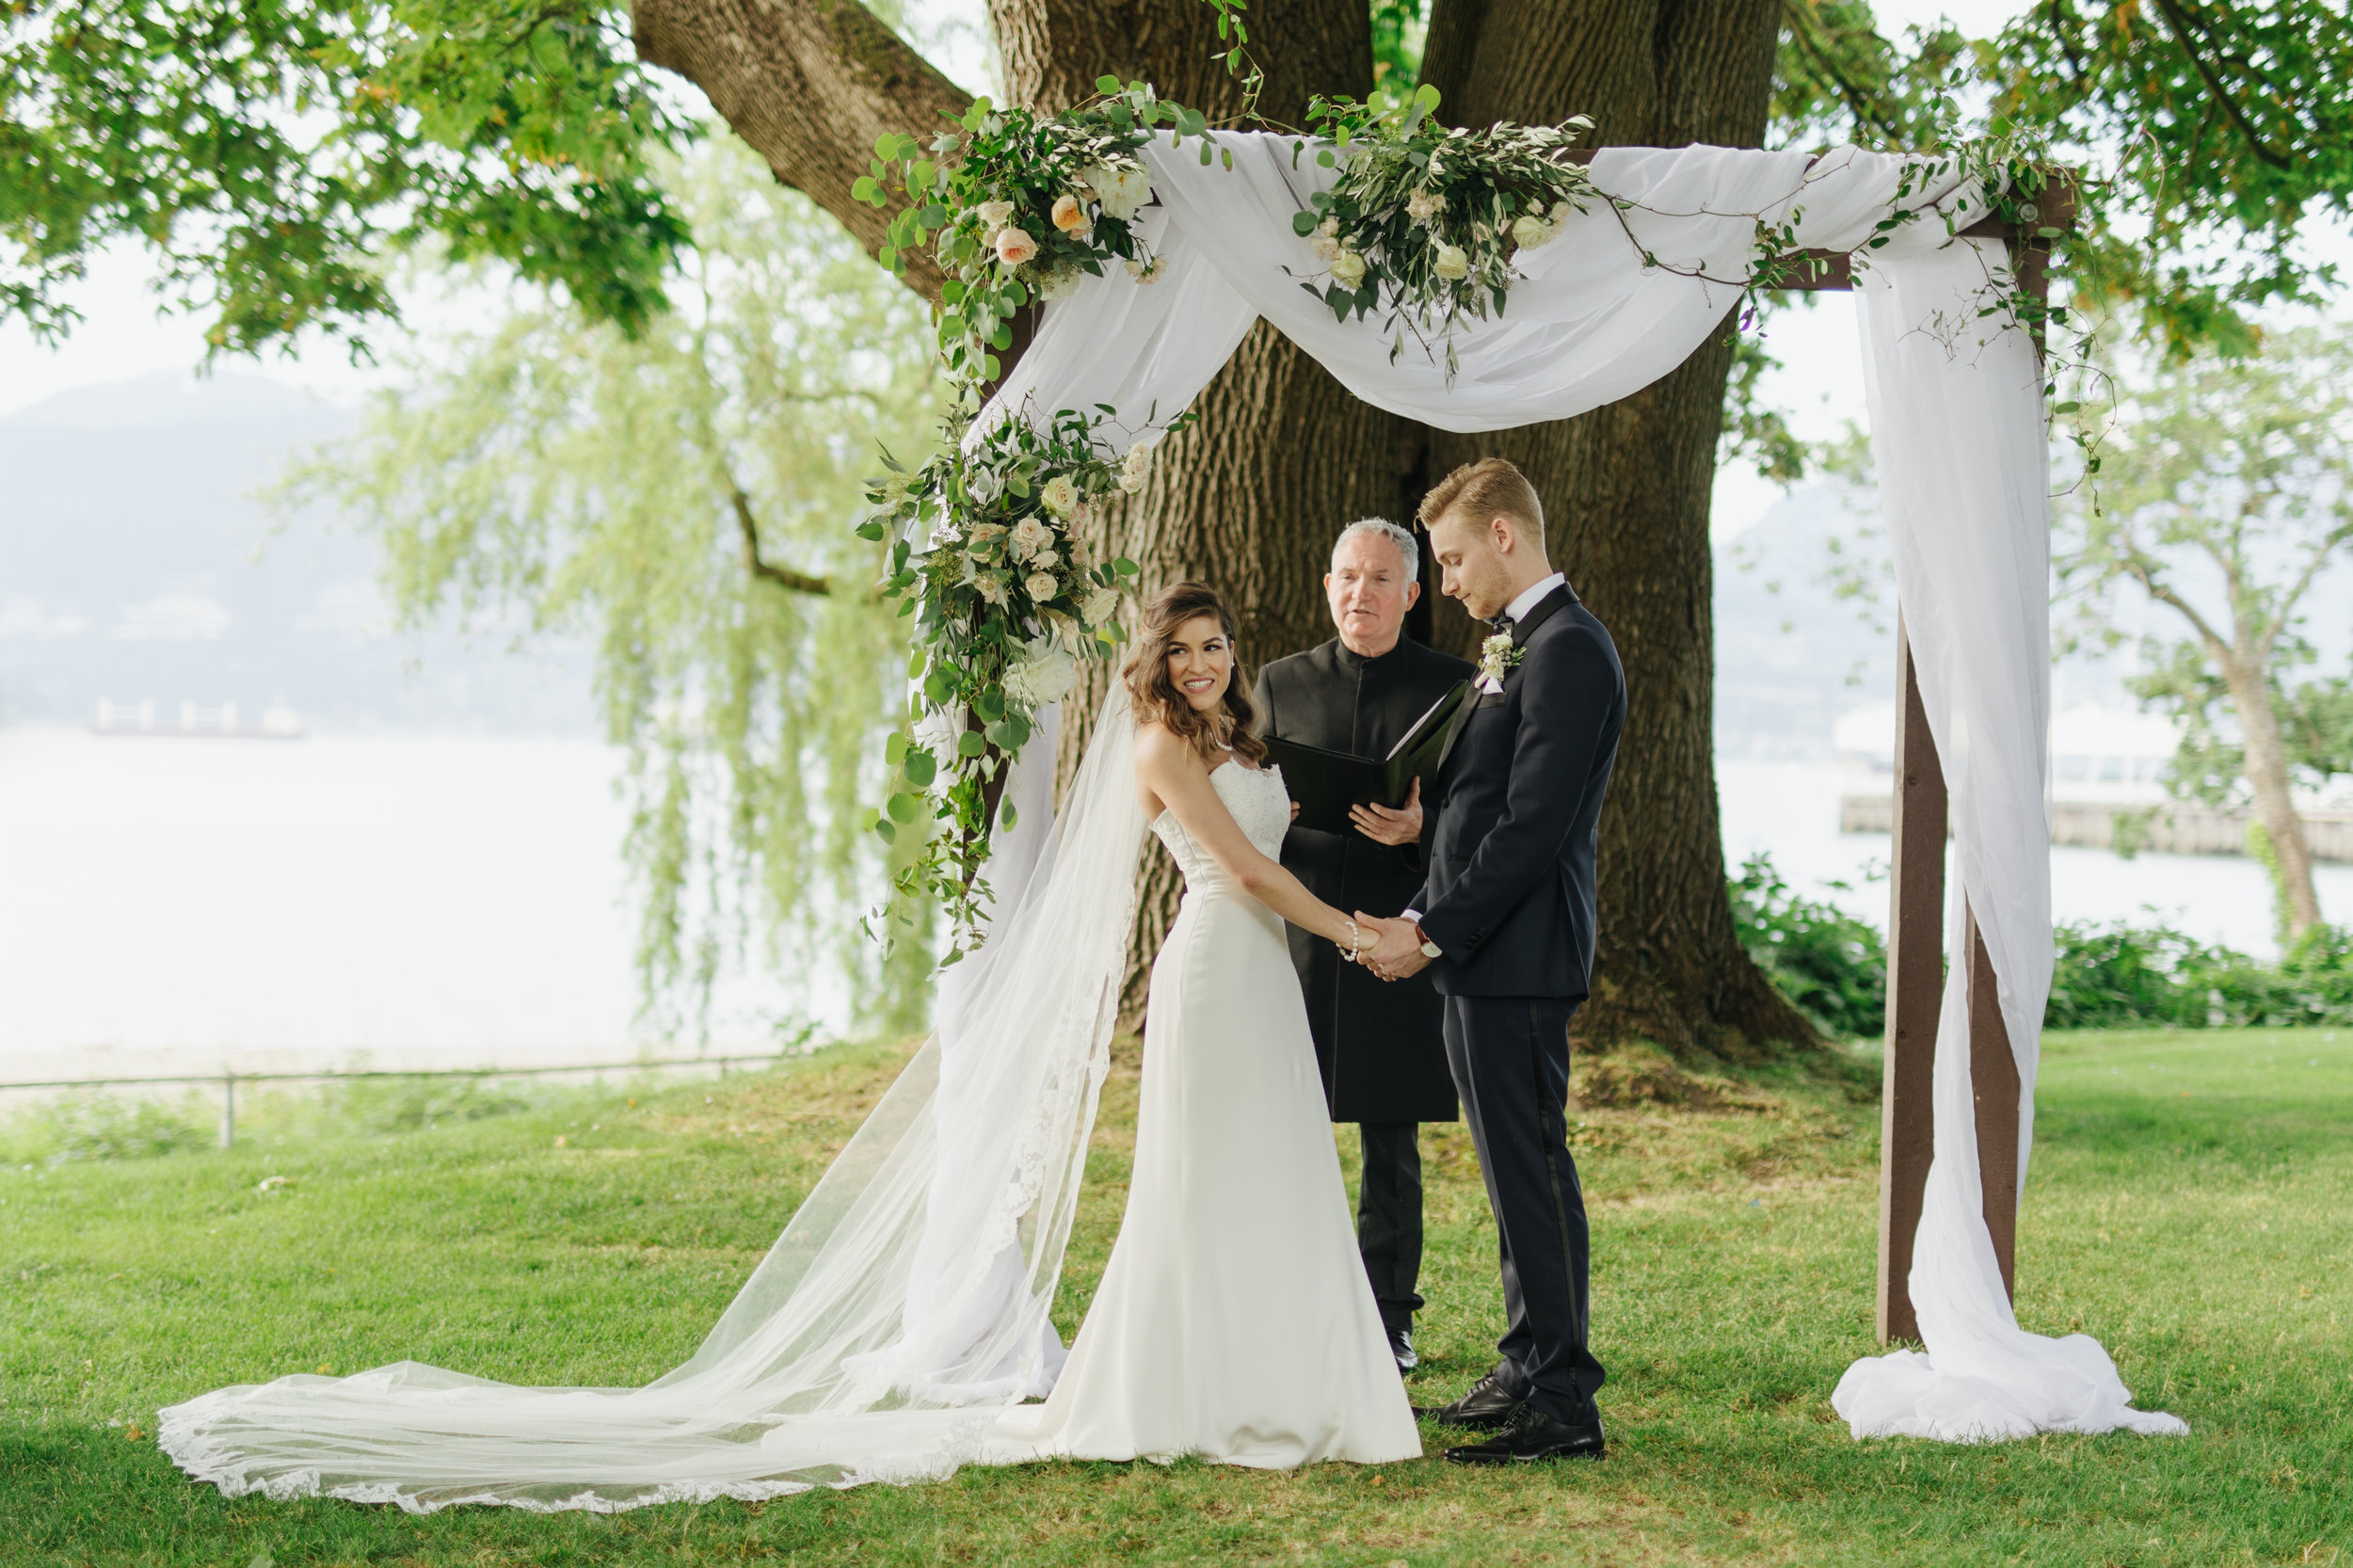 herastudios_wedding_sadaf_logan_hera_selects-44.jpg